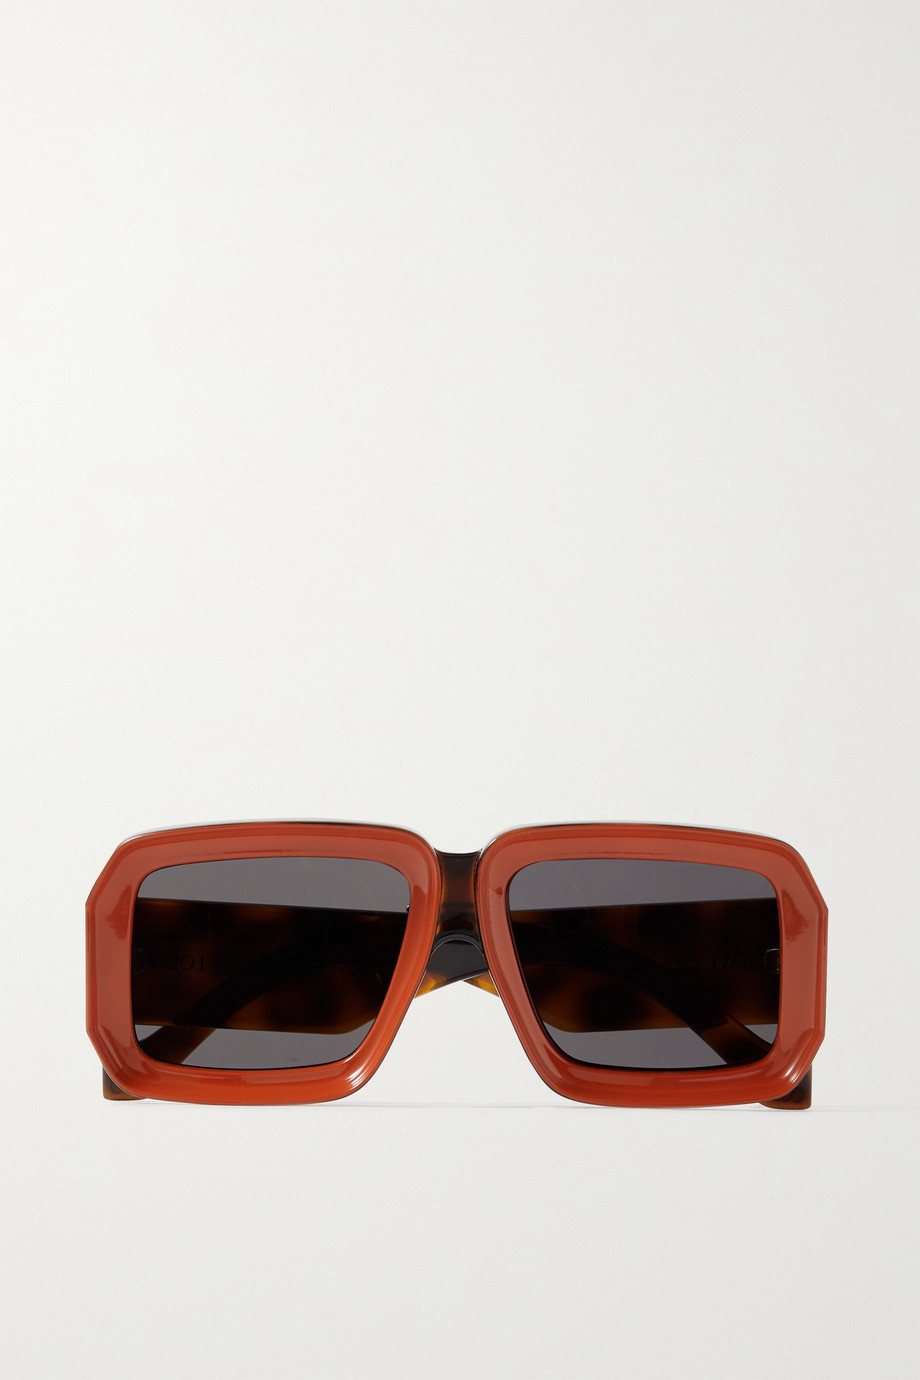 Loewe + Paula's Ibiza square-frame acetate sunglasses